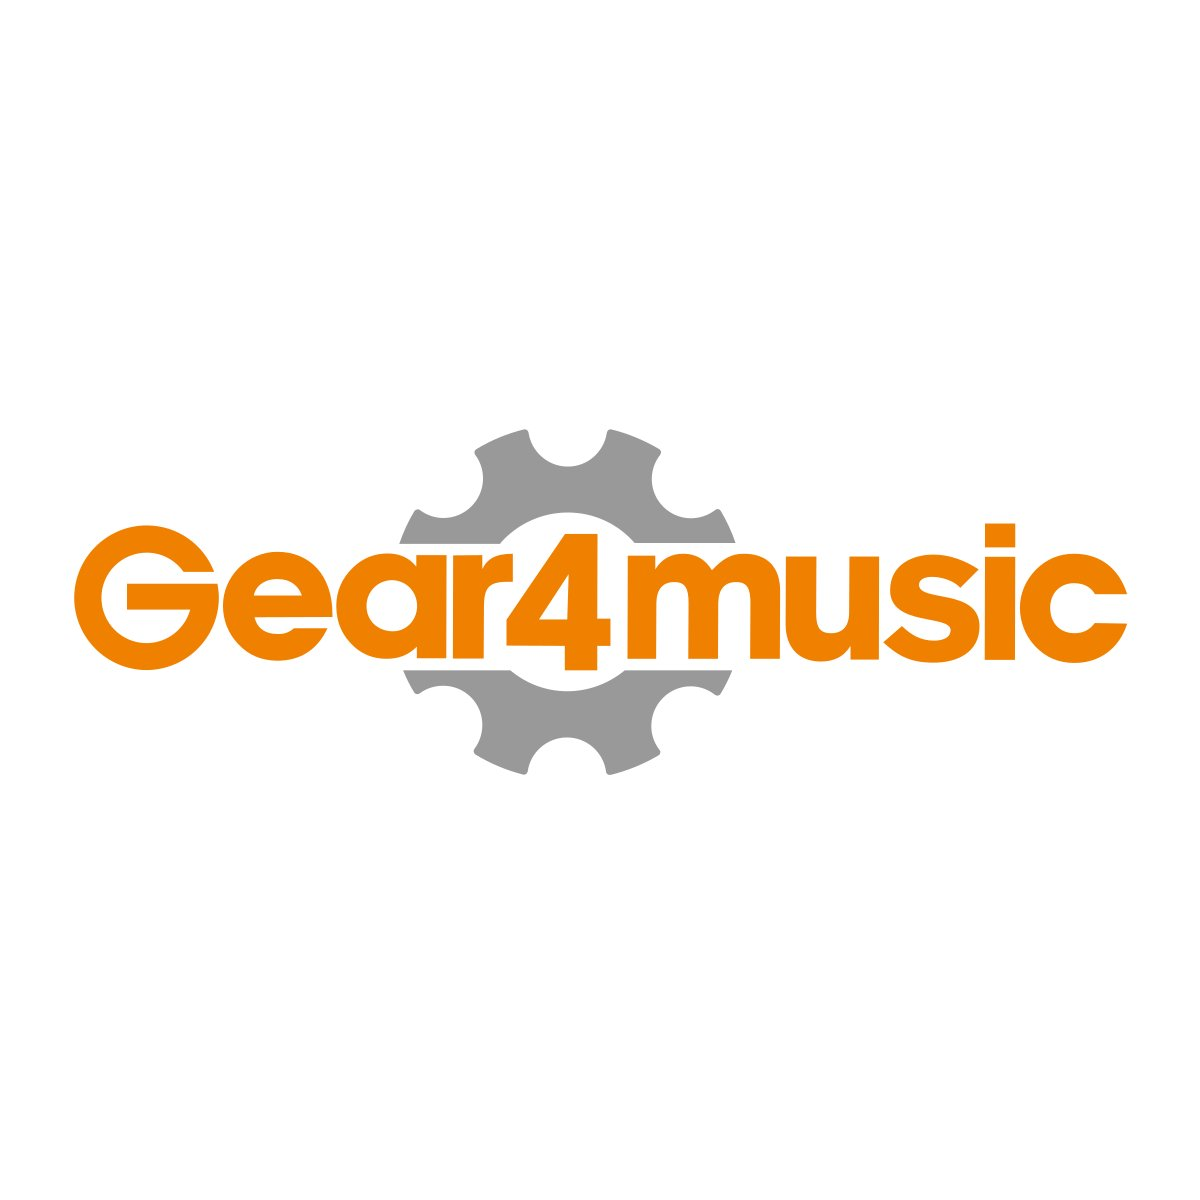 Goede JDP-1 Digitale Kinderpiano van Gear4music, Wit | Gear4music LK-01